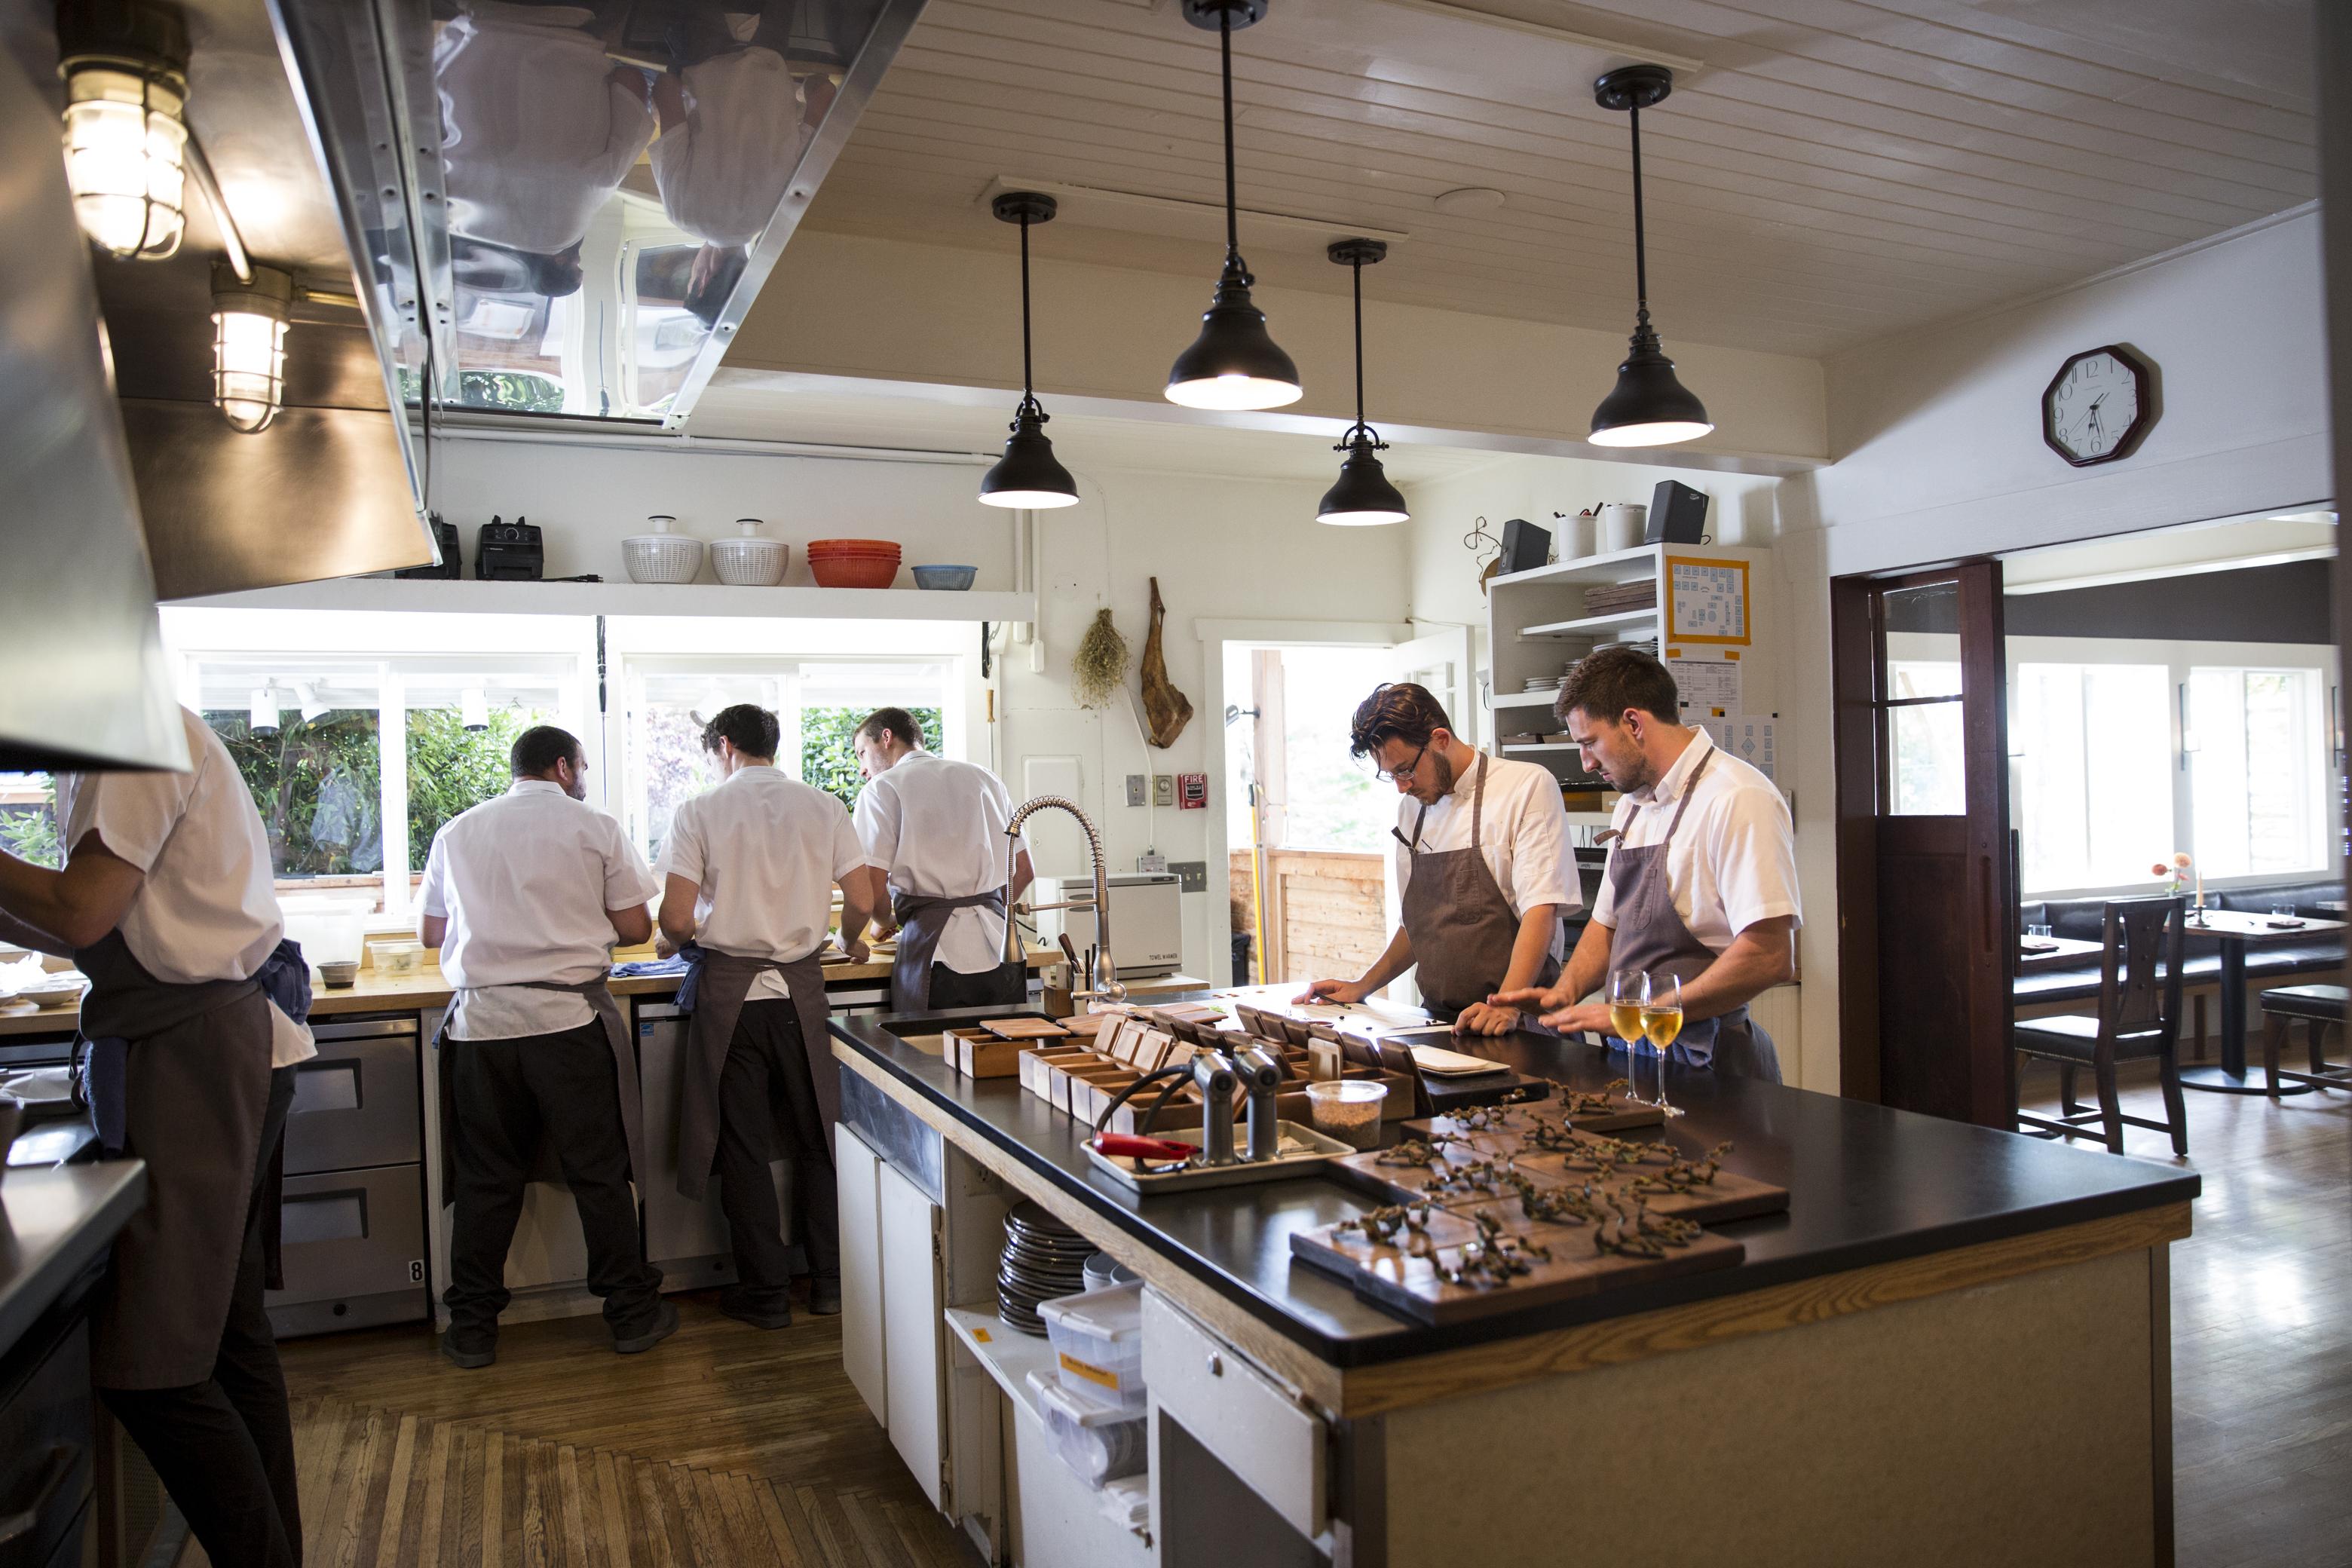 The Willows Inn kitchen (2017). Photo: Charity Burggraaf